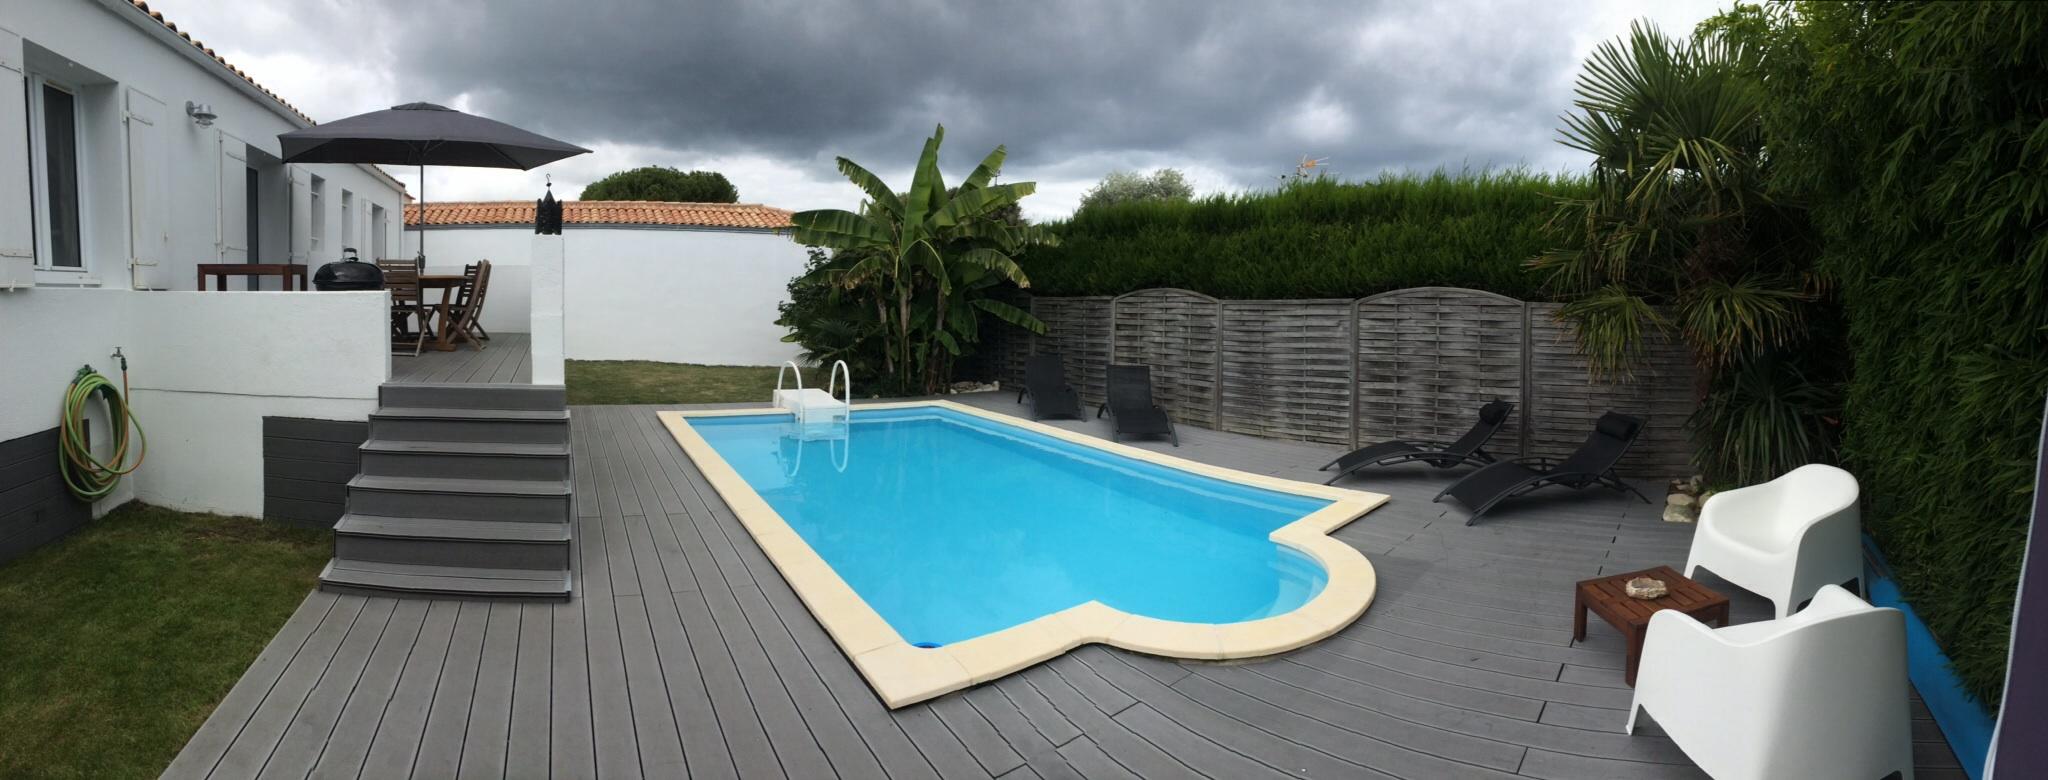 Location ile de r saint martin de r encantadora for Piscina en jardin de 100 metros